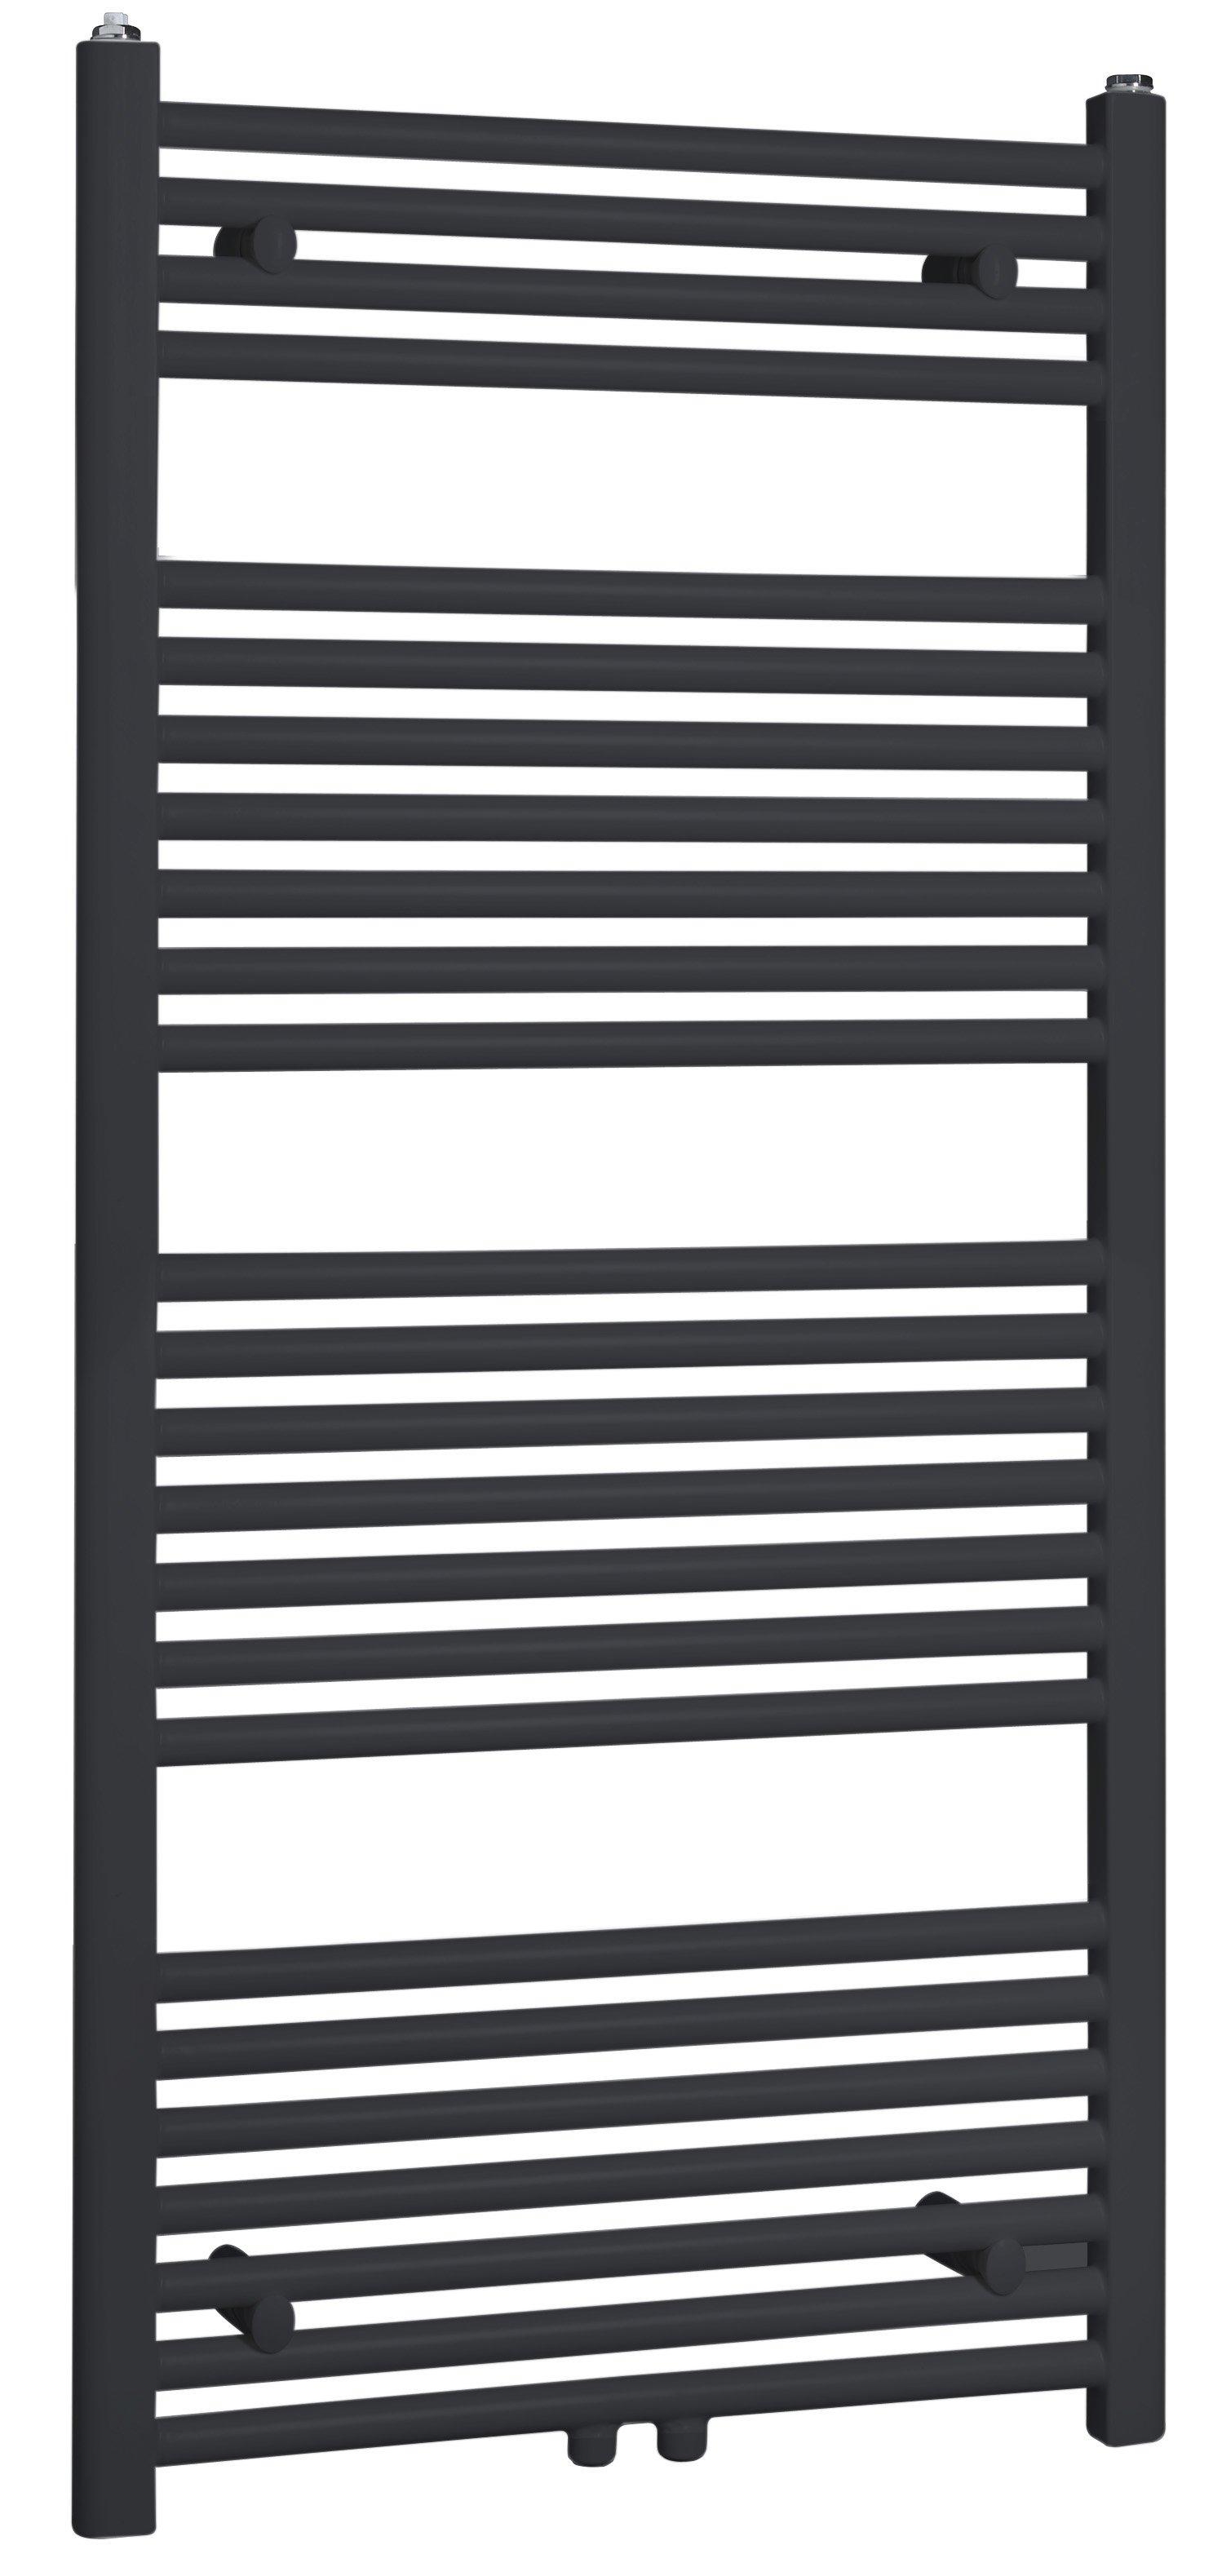 Best Design Zwoly designradiator recht model 120 x 60 cm zwart- ral 9011